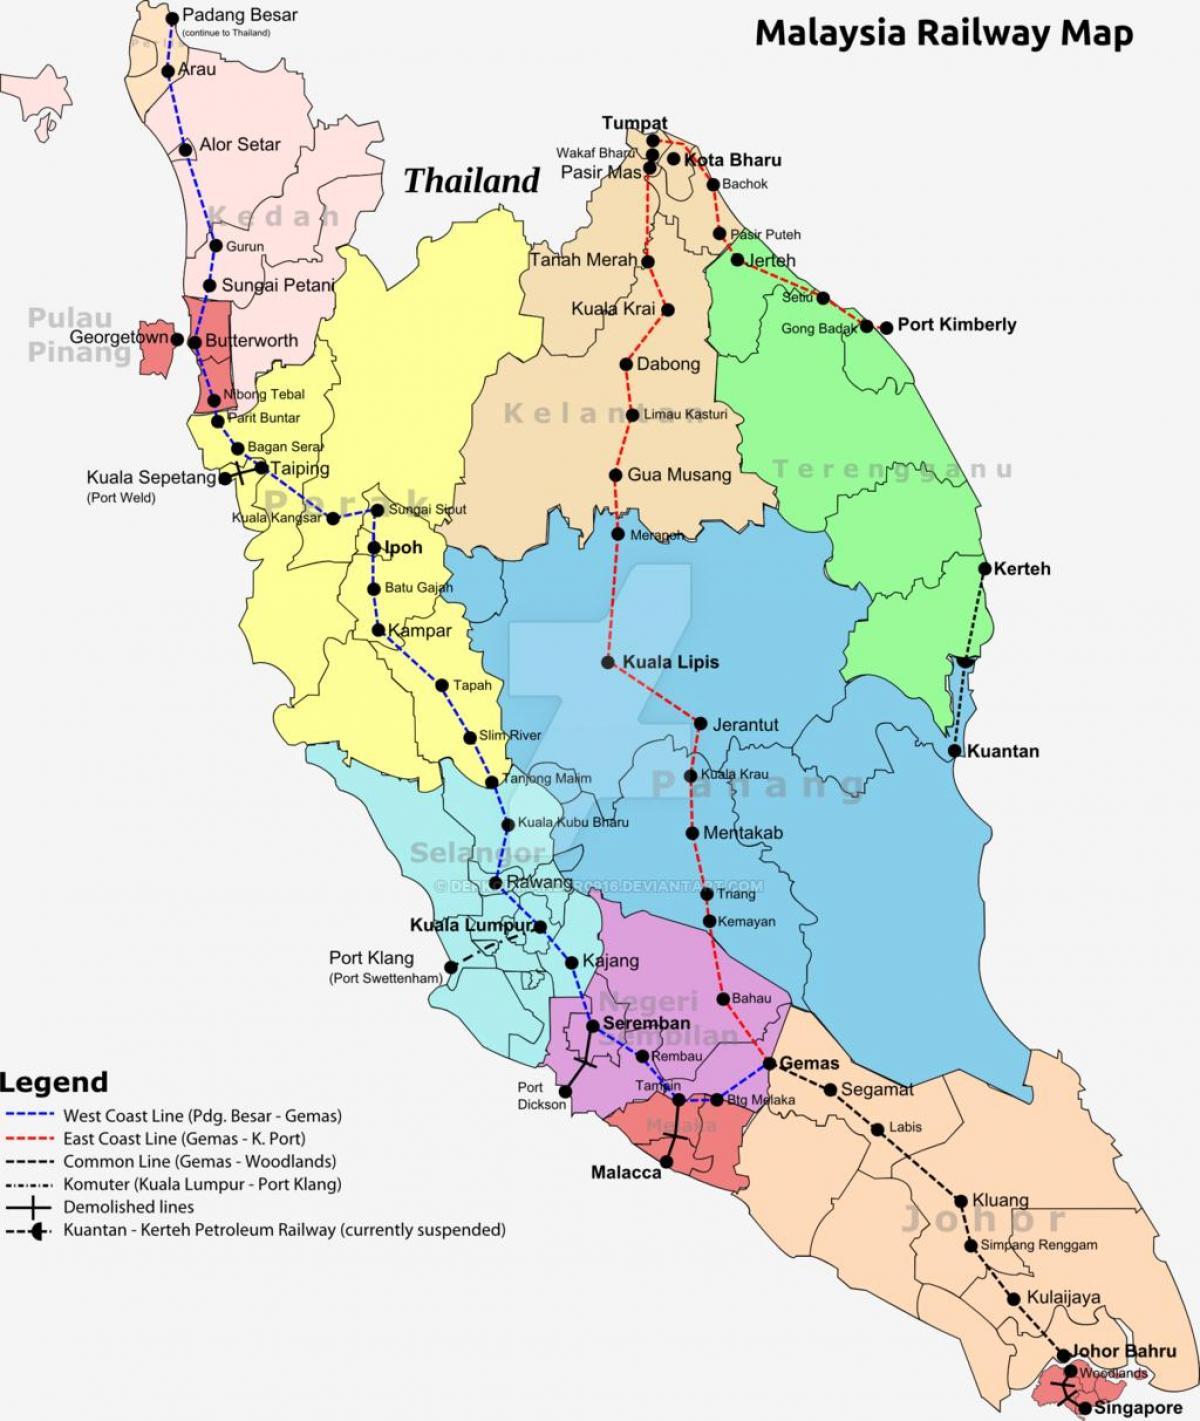 Malaysia railway map - Train map of malaysia (South-Eastern Asia - Asia)